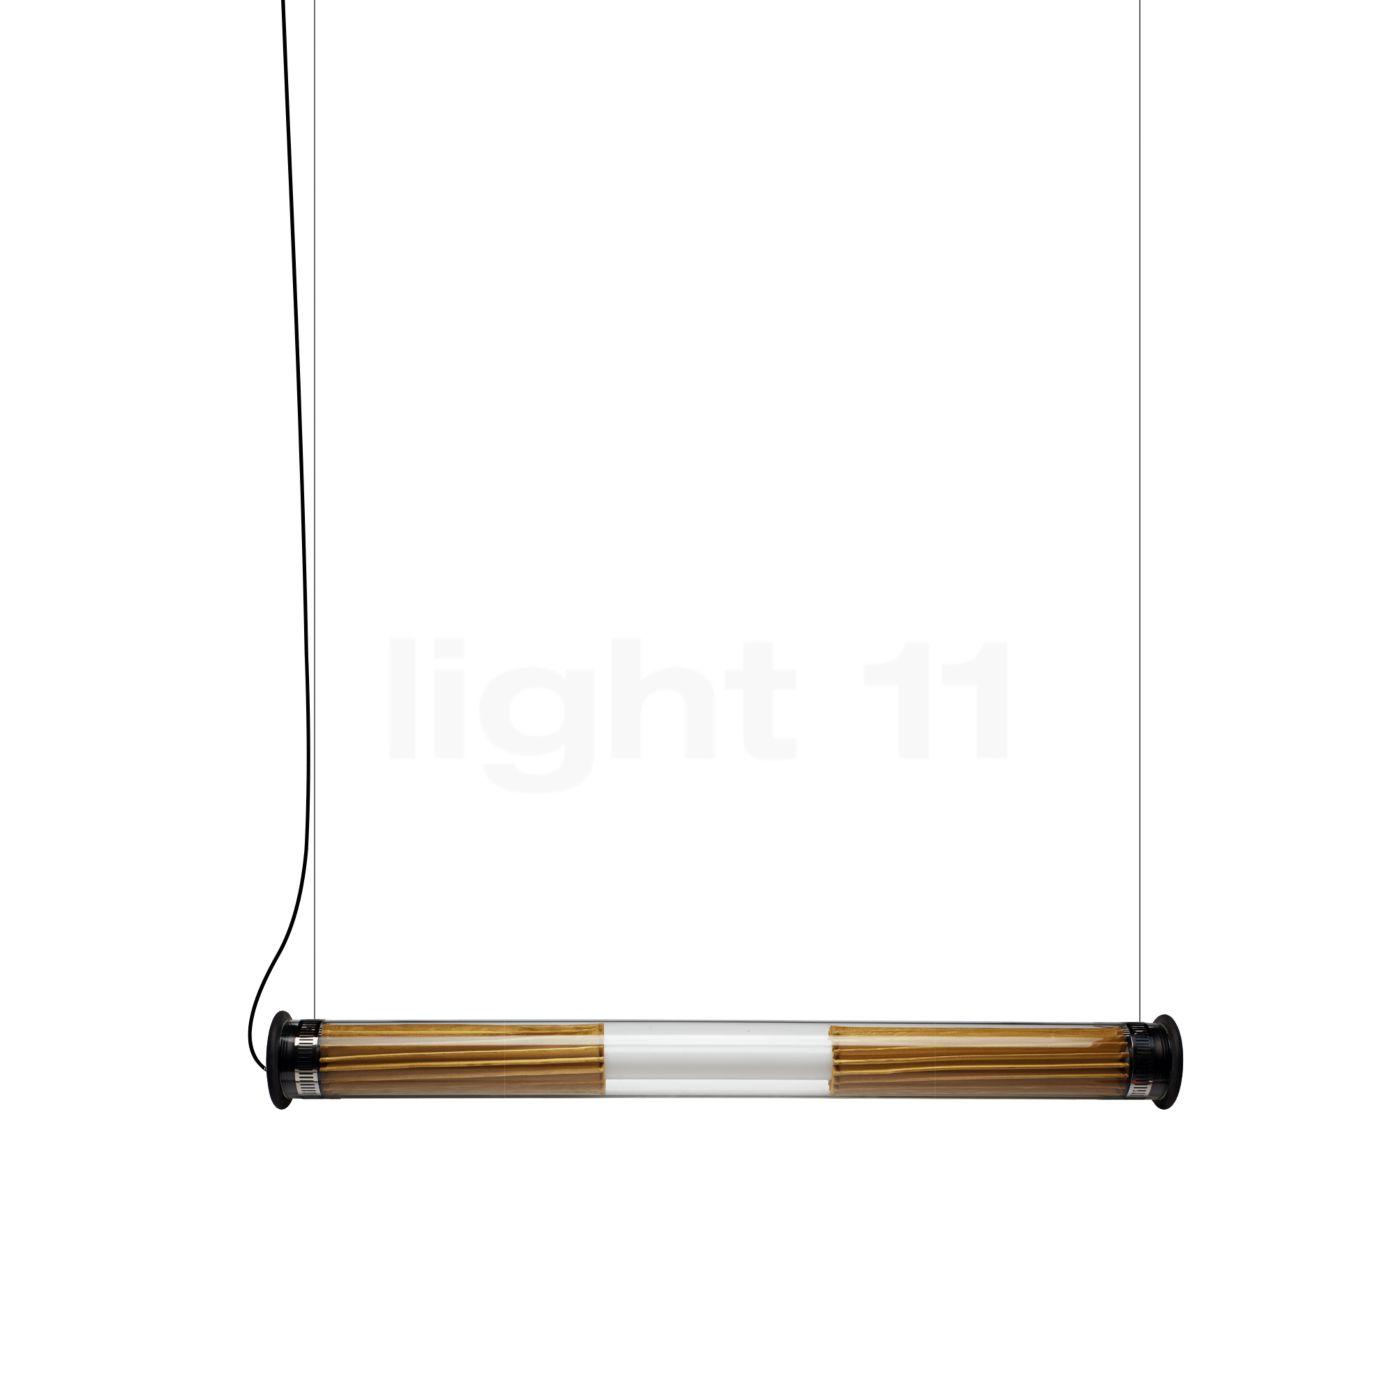 DCW In The Tube 360° - 700 Pendelleuchte LED, Mit Goldmaschen ITT 360-700 GOLD MESH